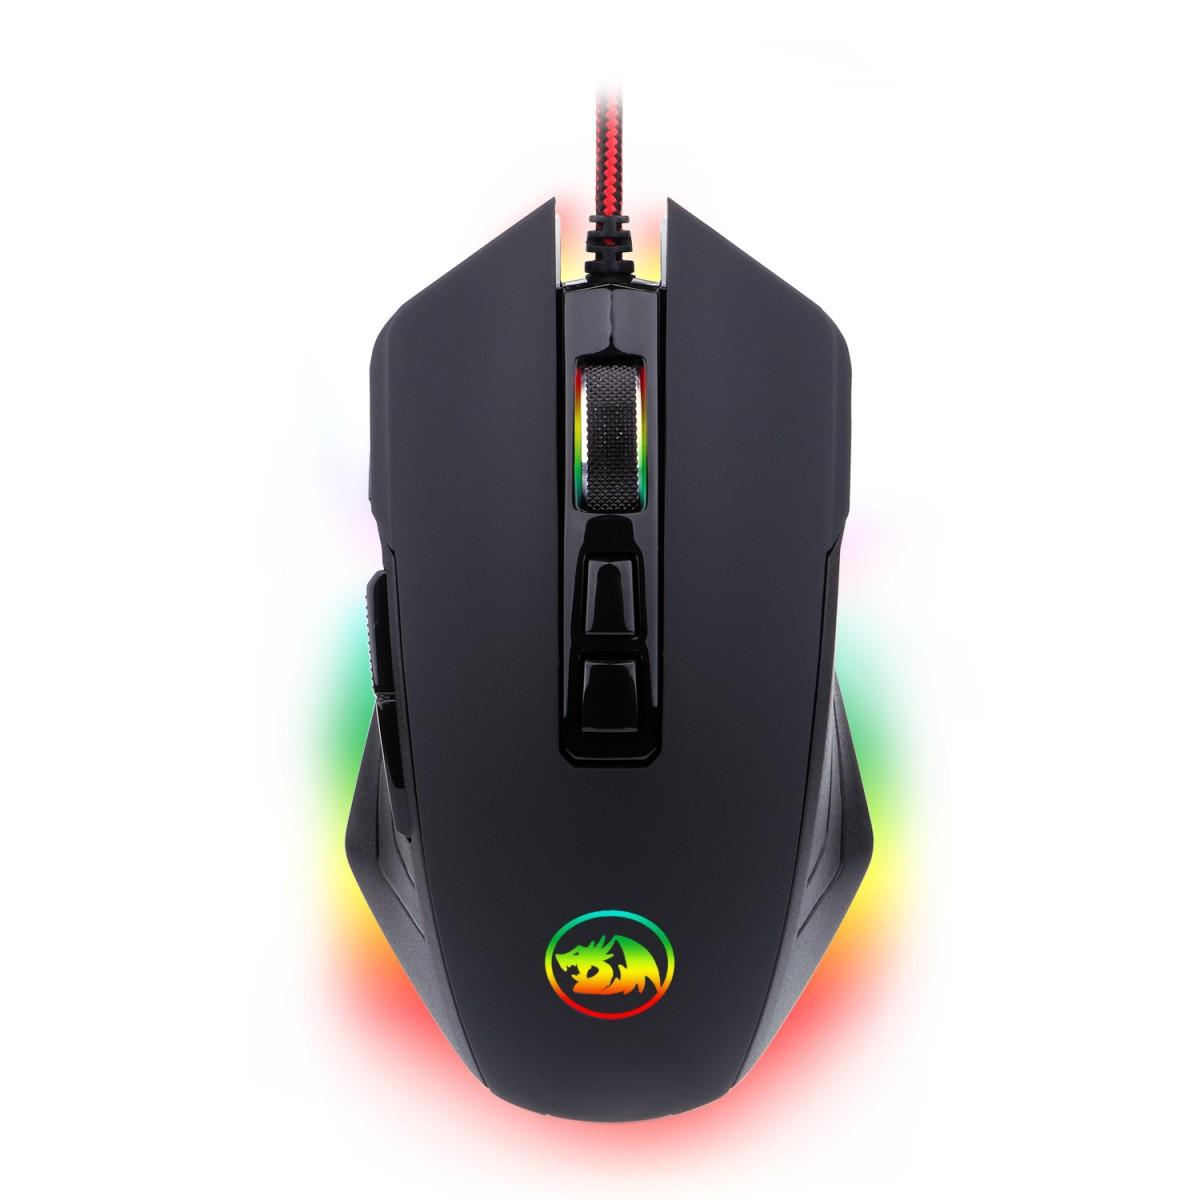 Mouse Gamer Redragon Dagger 2 RGB, 5000 DPI, 7 Botões, Black, M715RGB-1